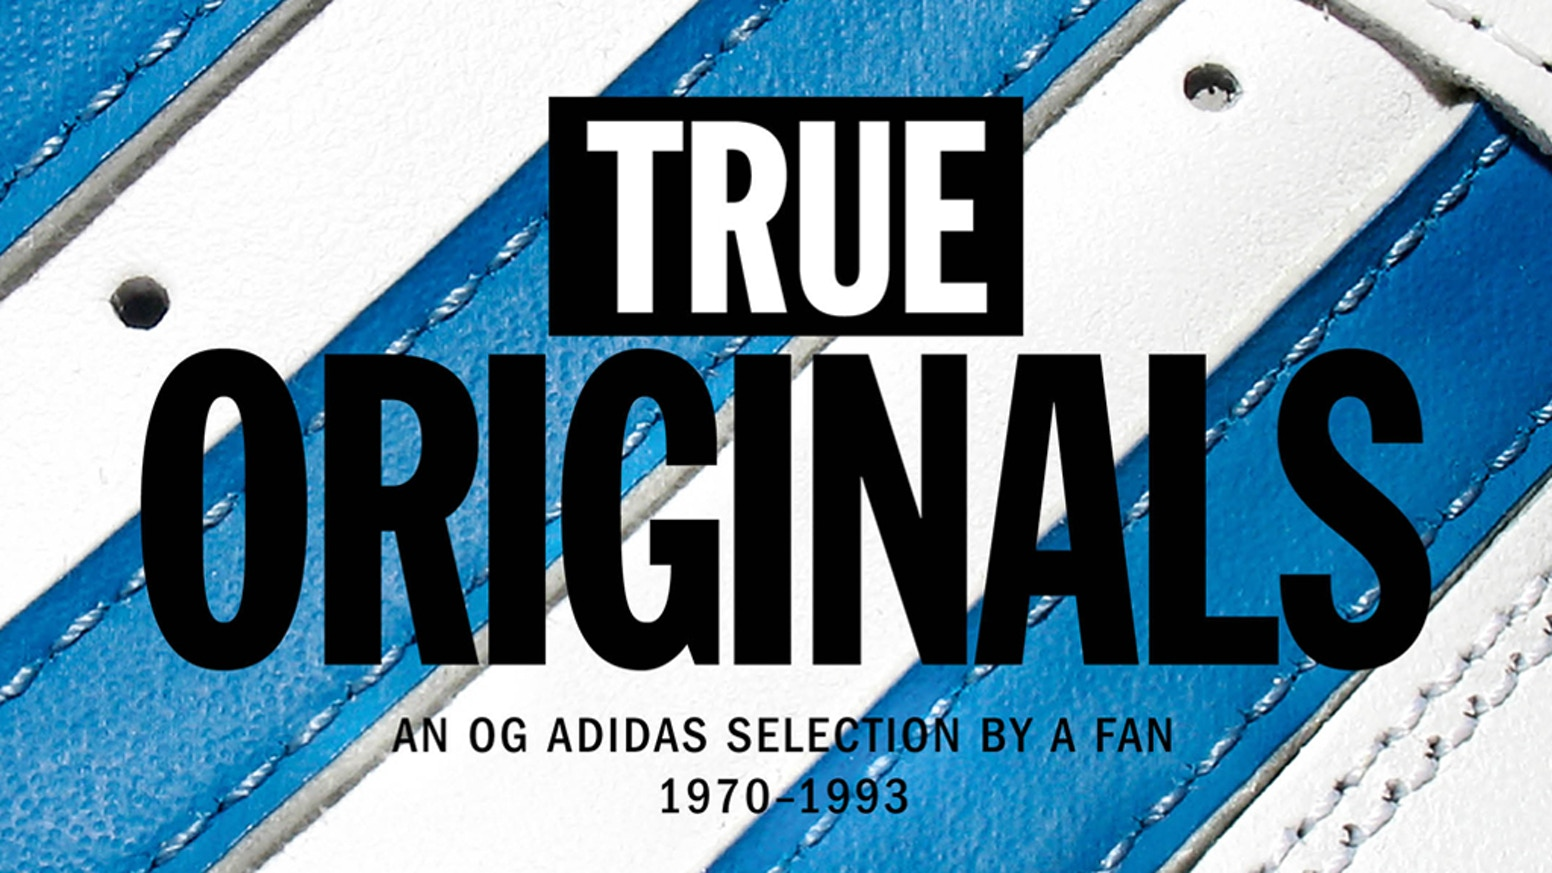 on sale 7438d f3c48 TRUE ORIGINALS. A fan tribute to the original adidas ...